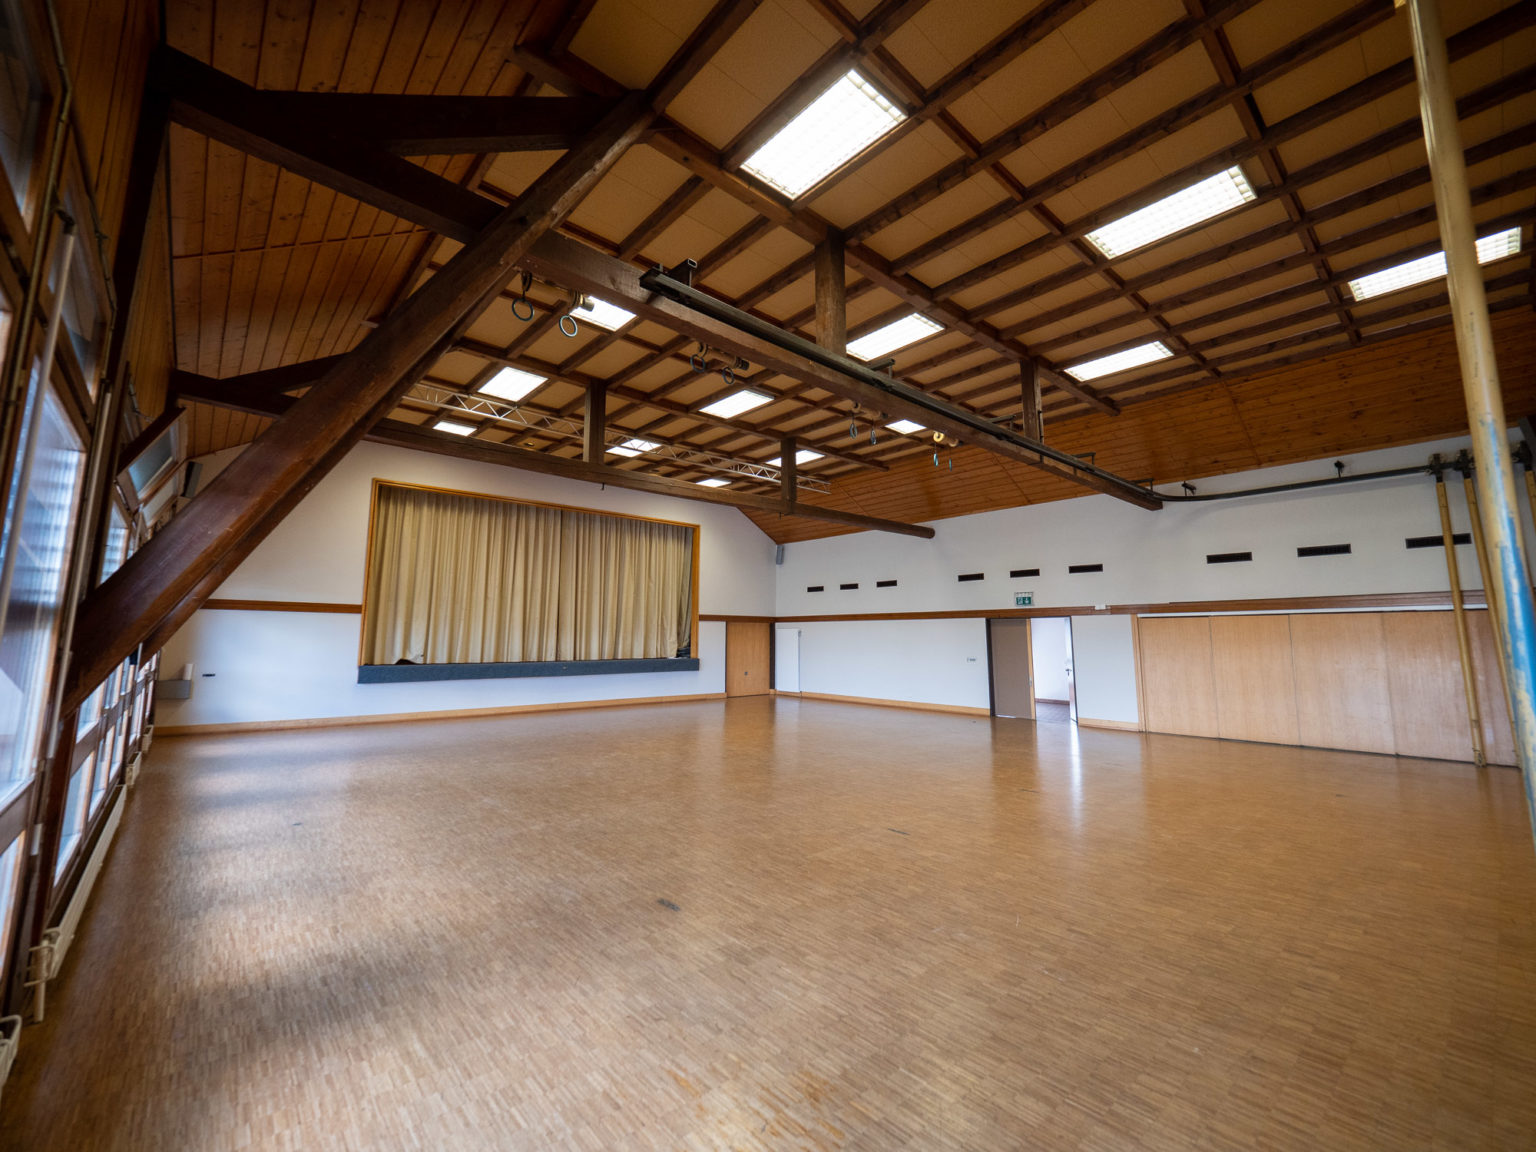 Refuges-salles-Montanaire_MAINIMAGE-©V-Dubach-52575